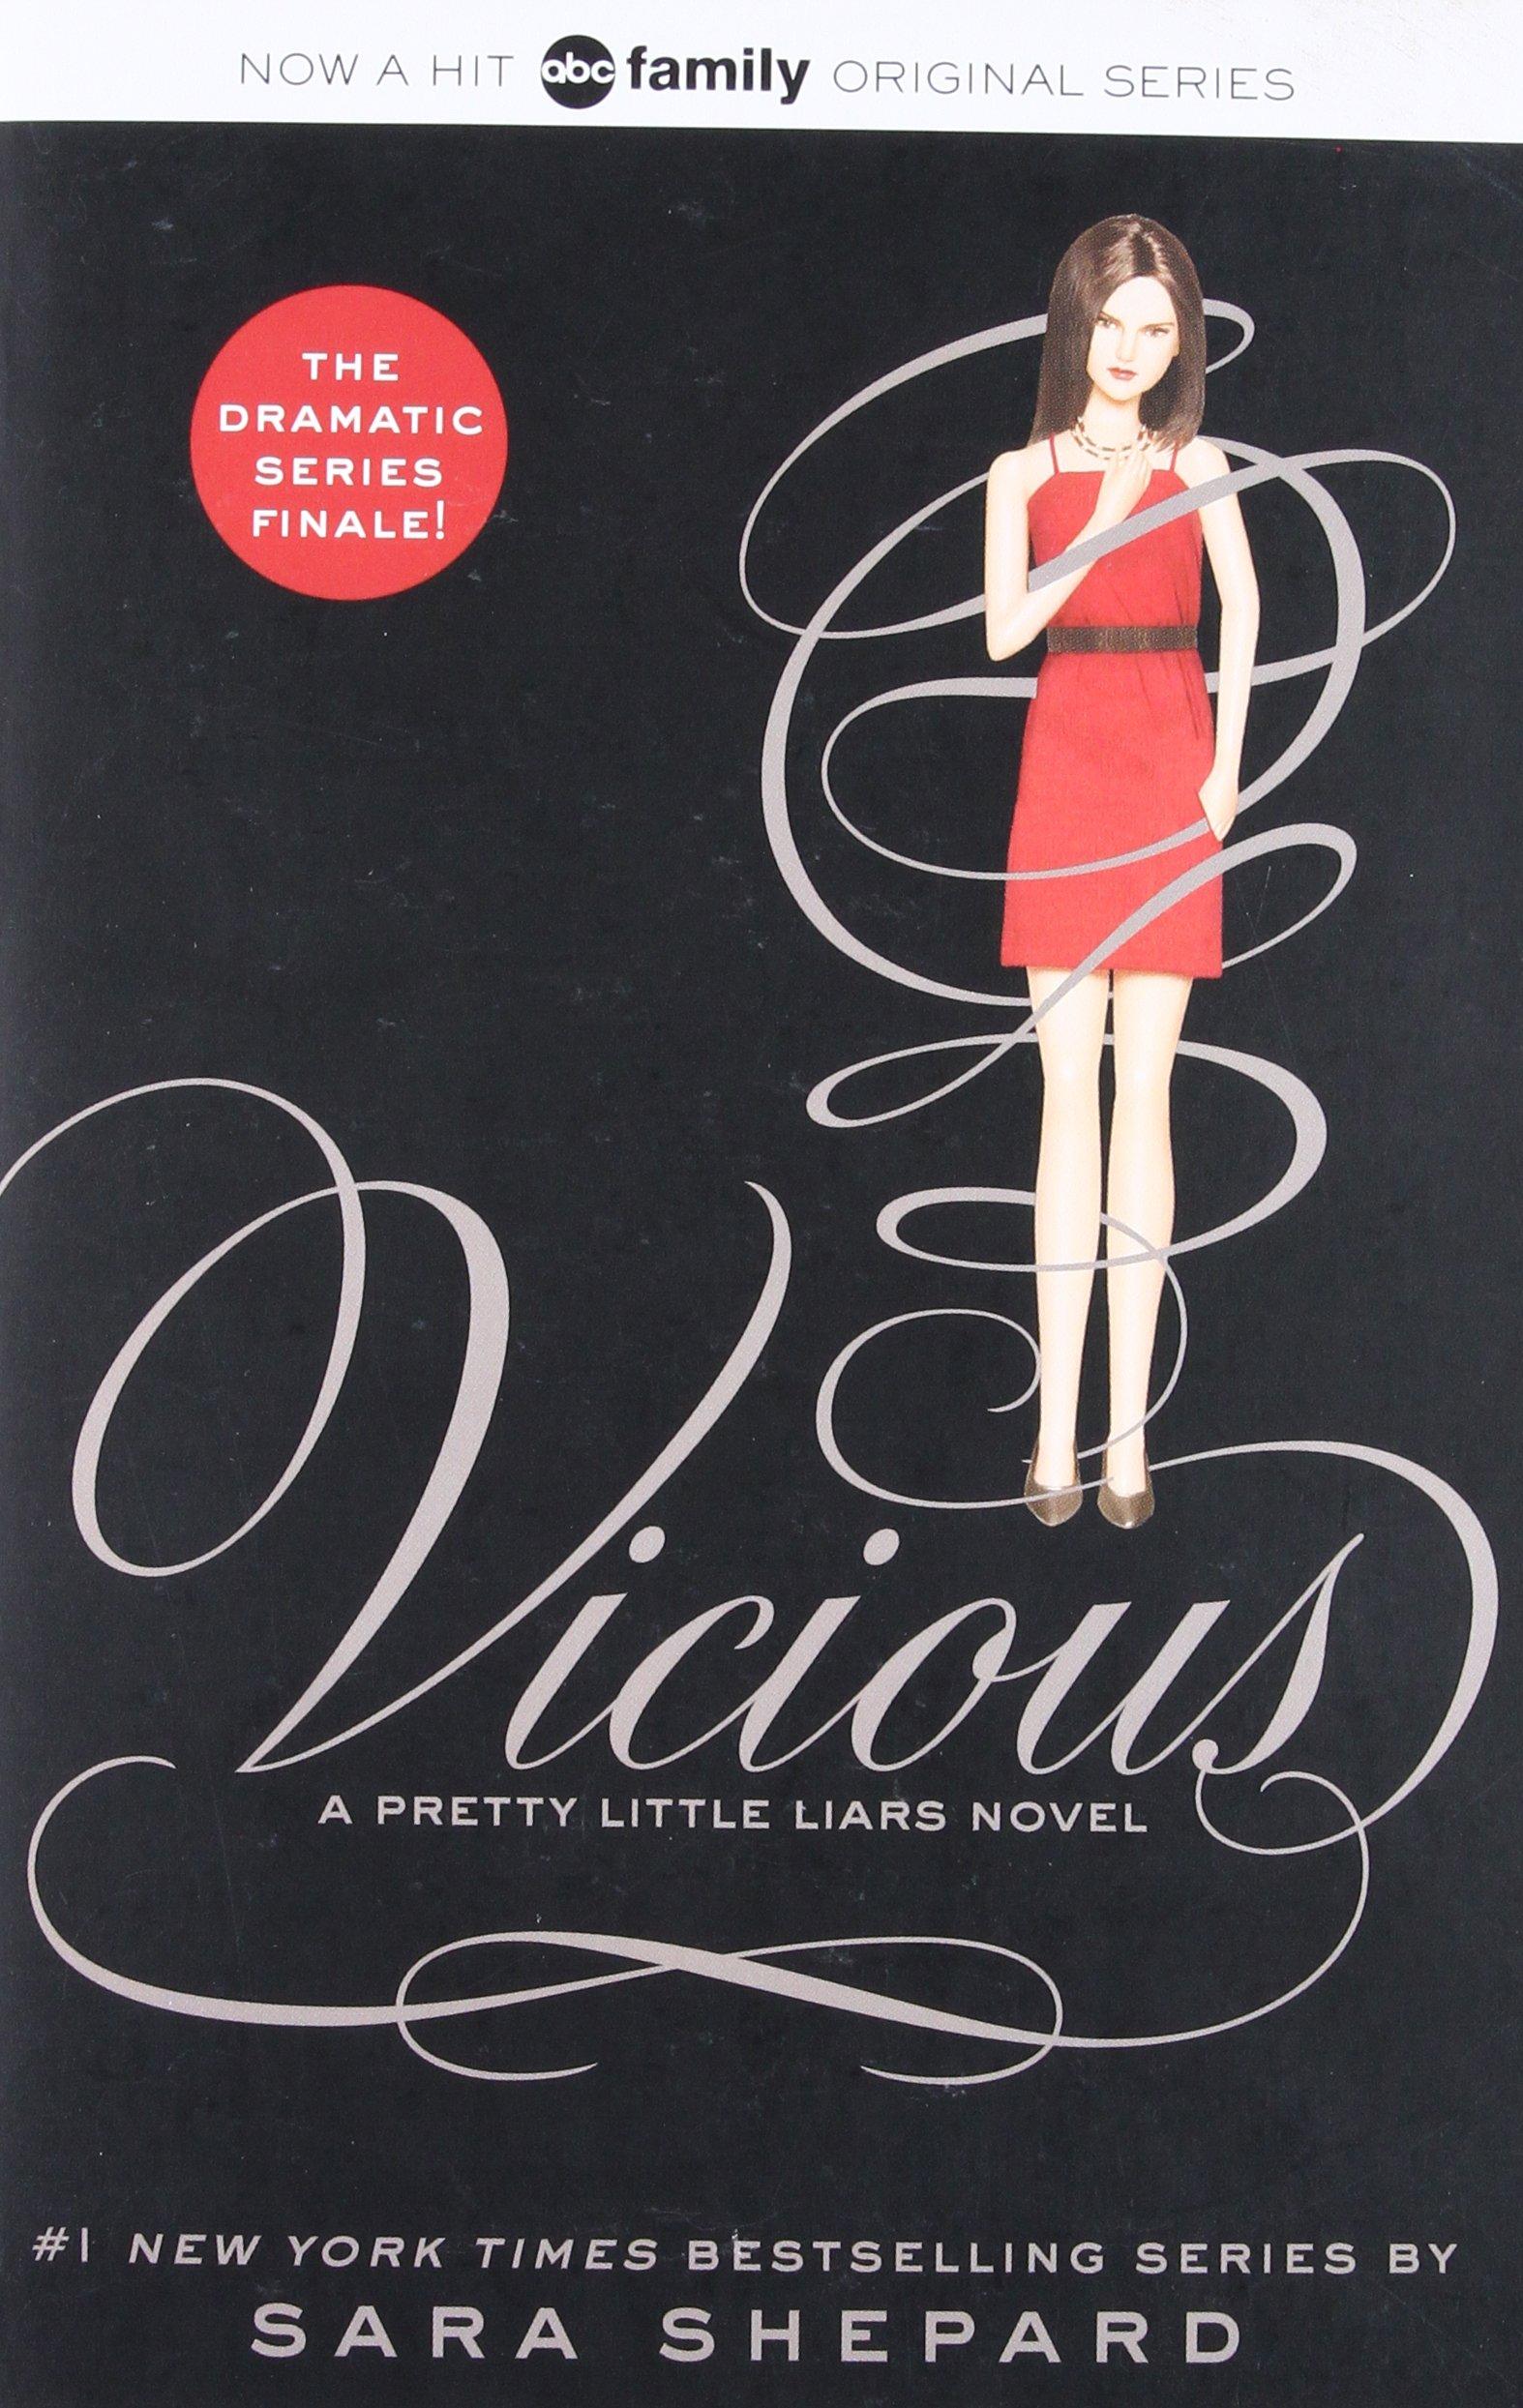 Pretty Little Liars Book 5 Wicked Pdf